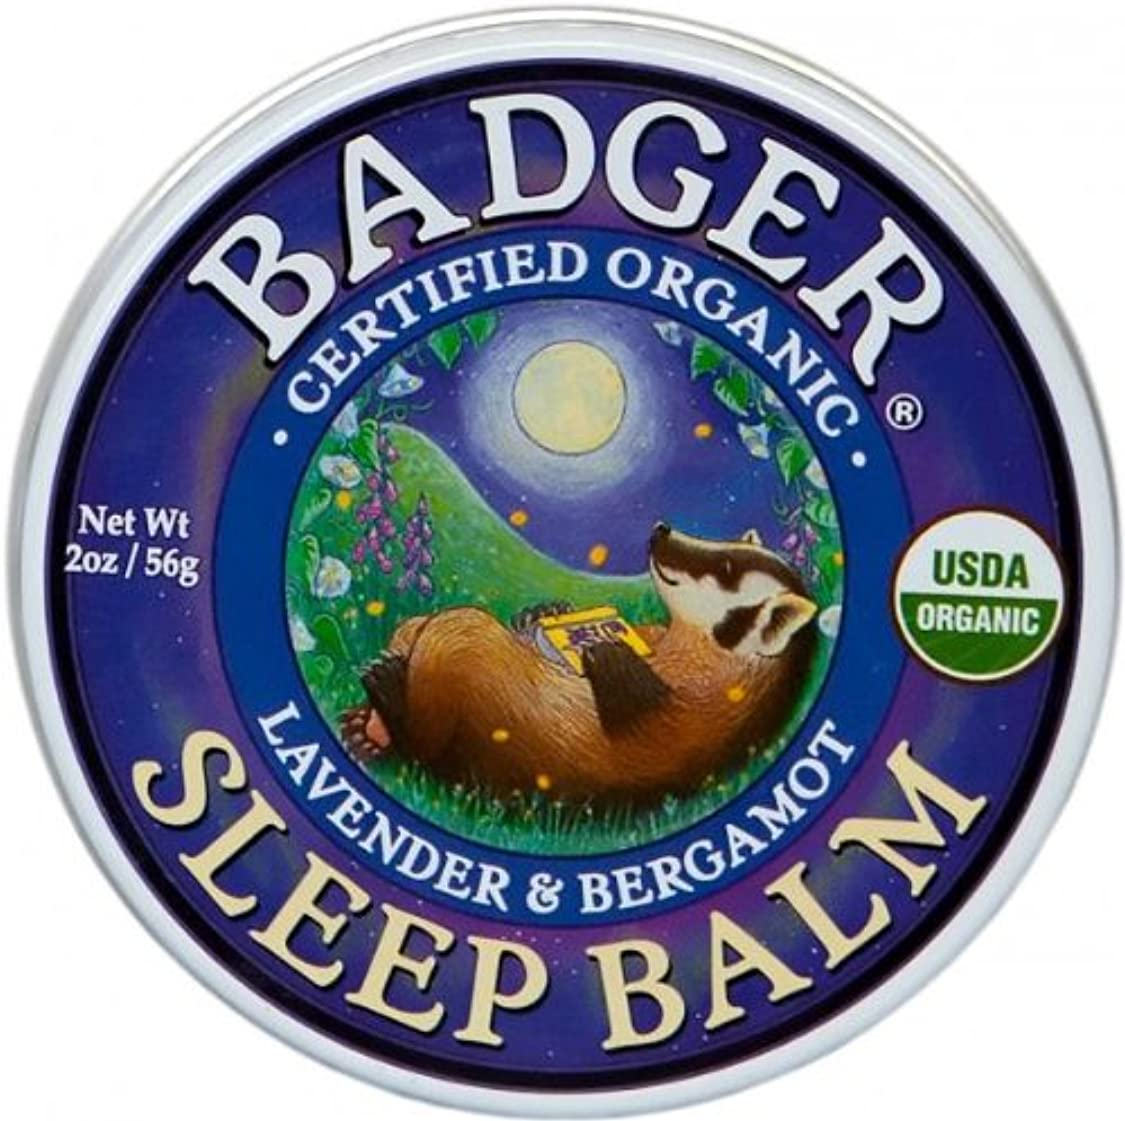 Badger バジャー オーガニック スリープバーム おやすみ前アロマクリーム【大サイズ】 56g【海外直送品】【並行輸入品】